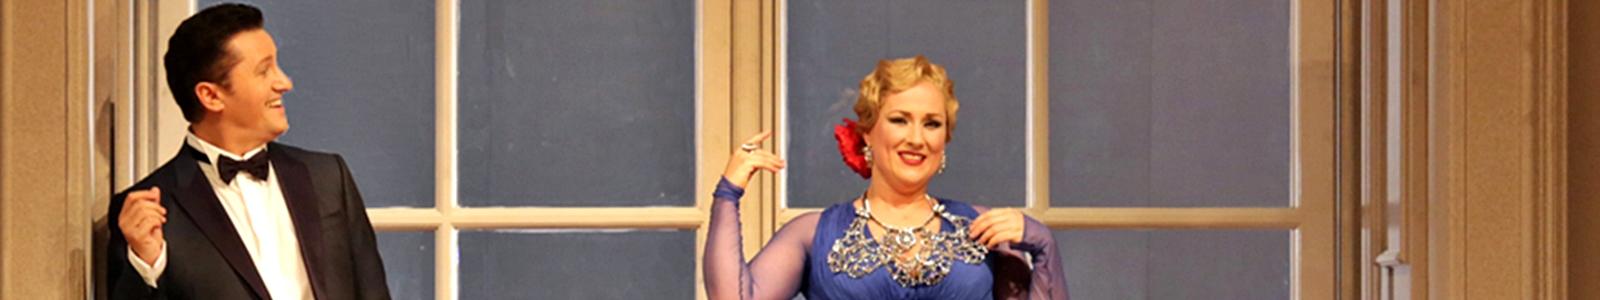 traviata damrau scala